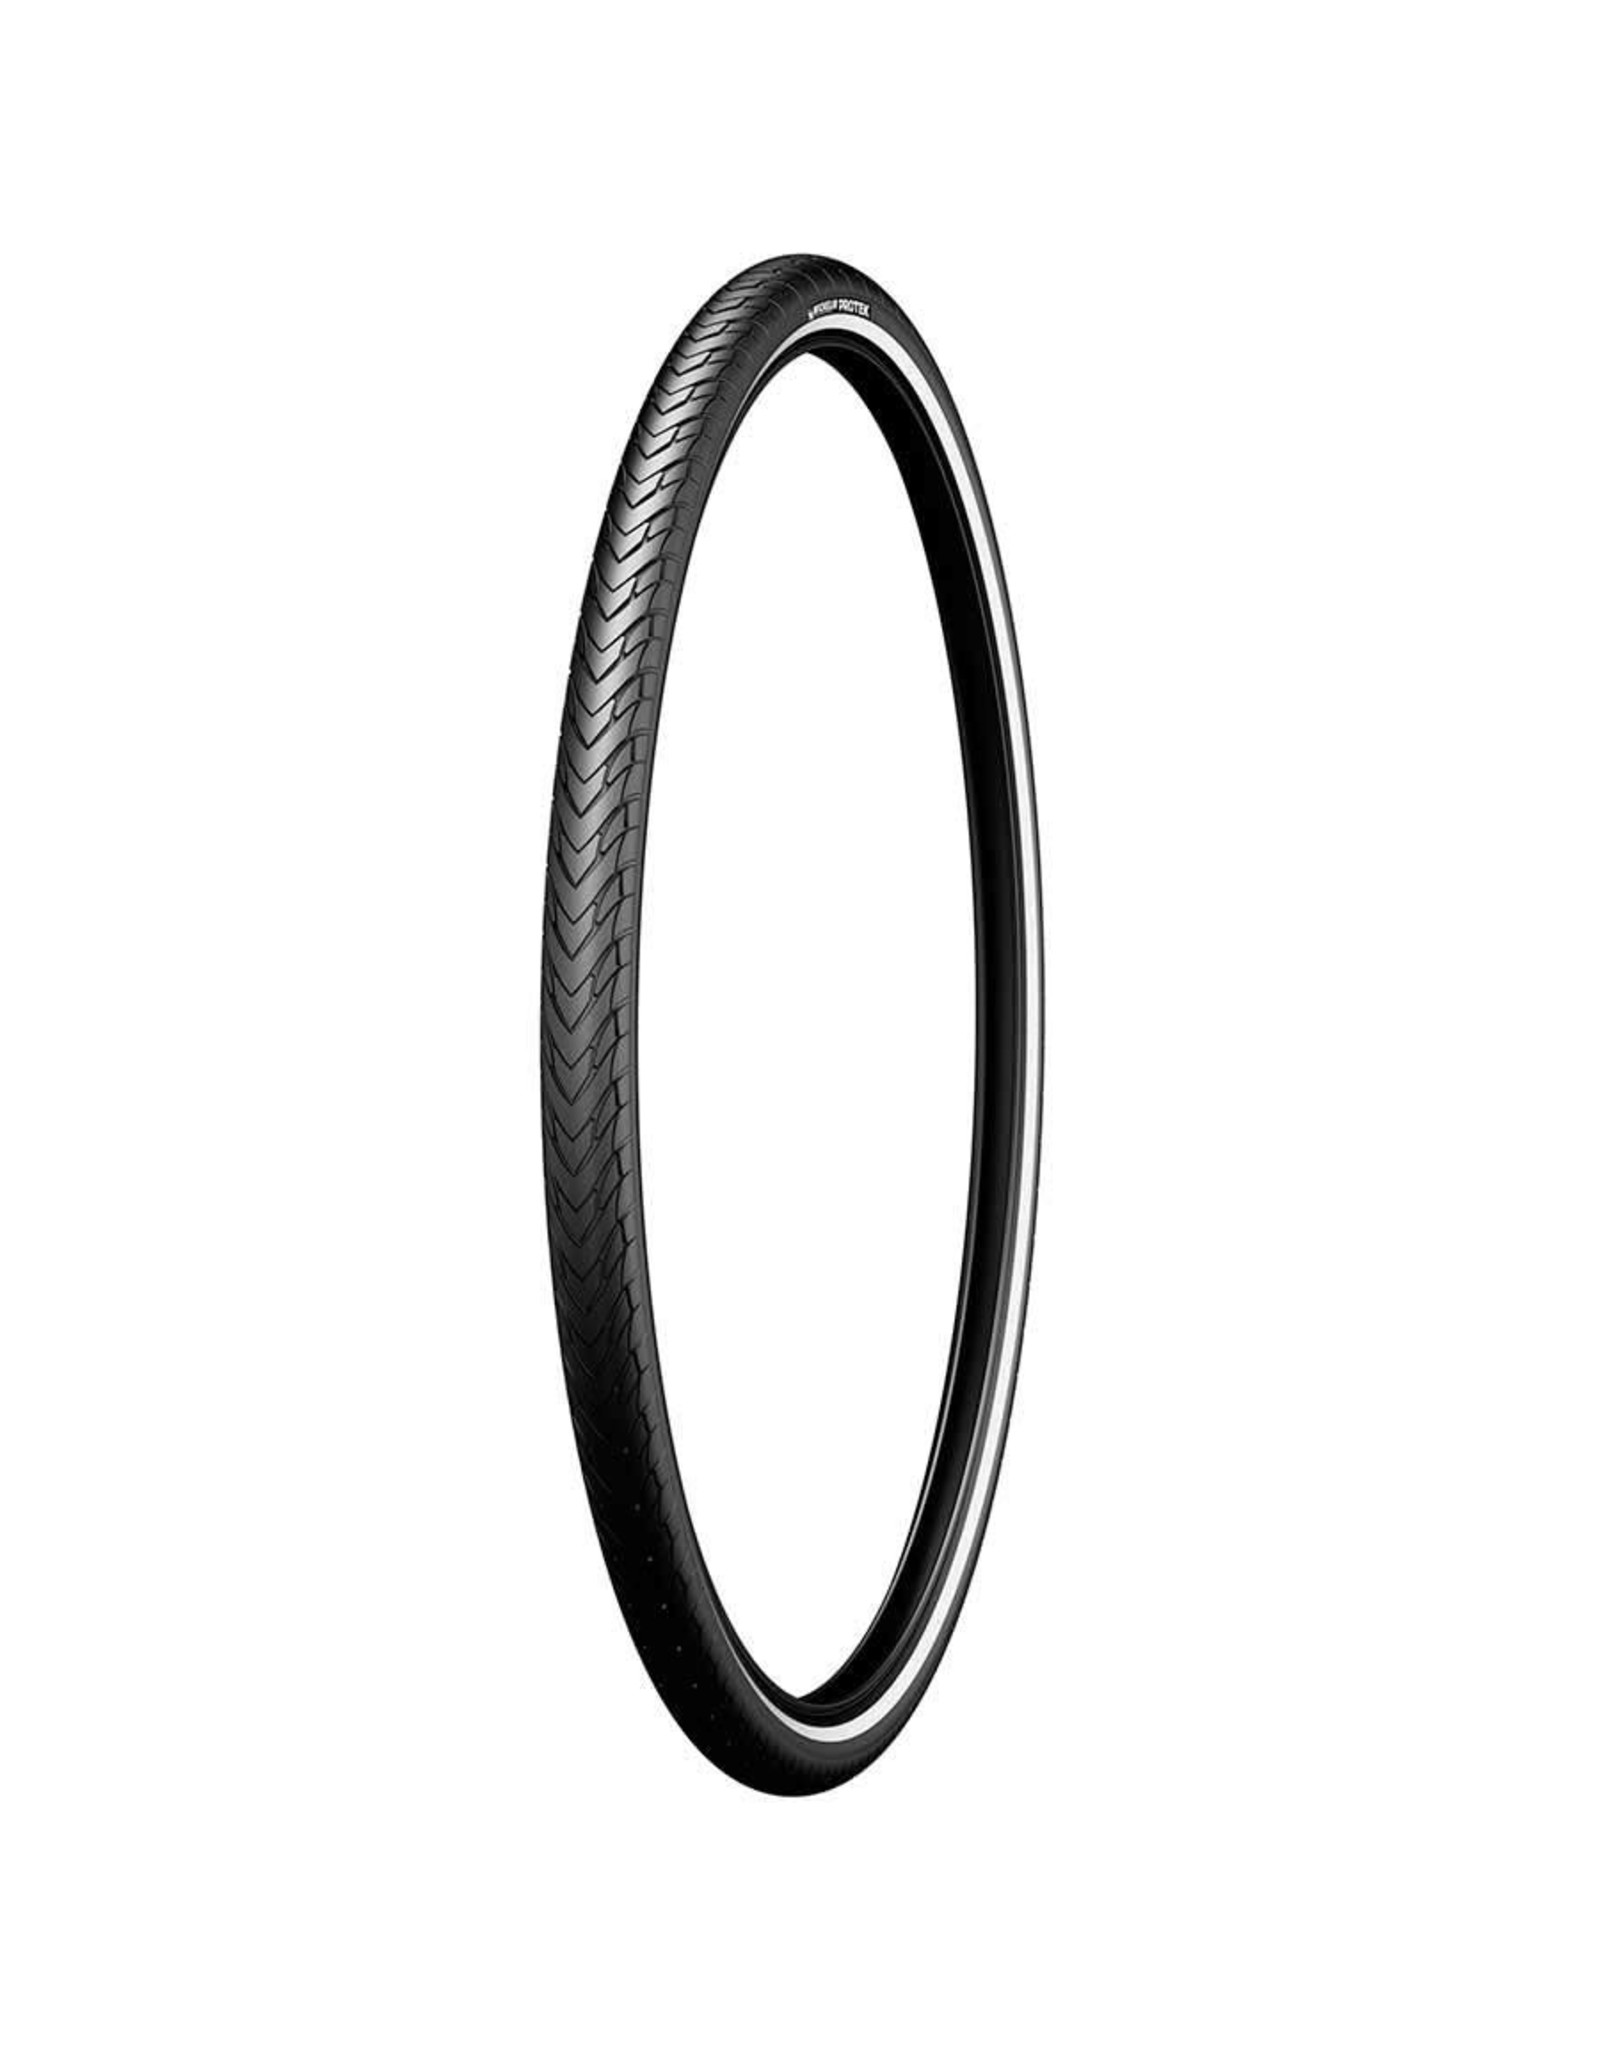 Michelin Protek, 700x35C, Rigide